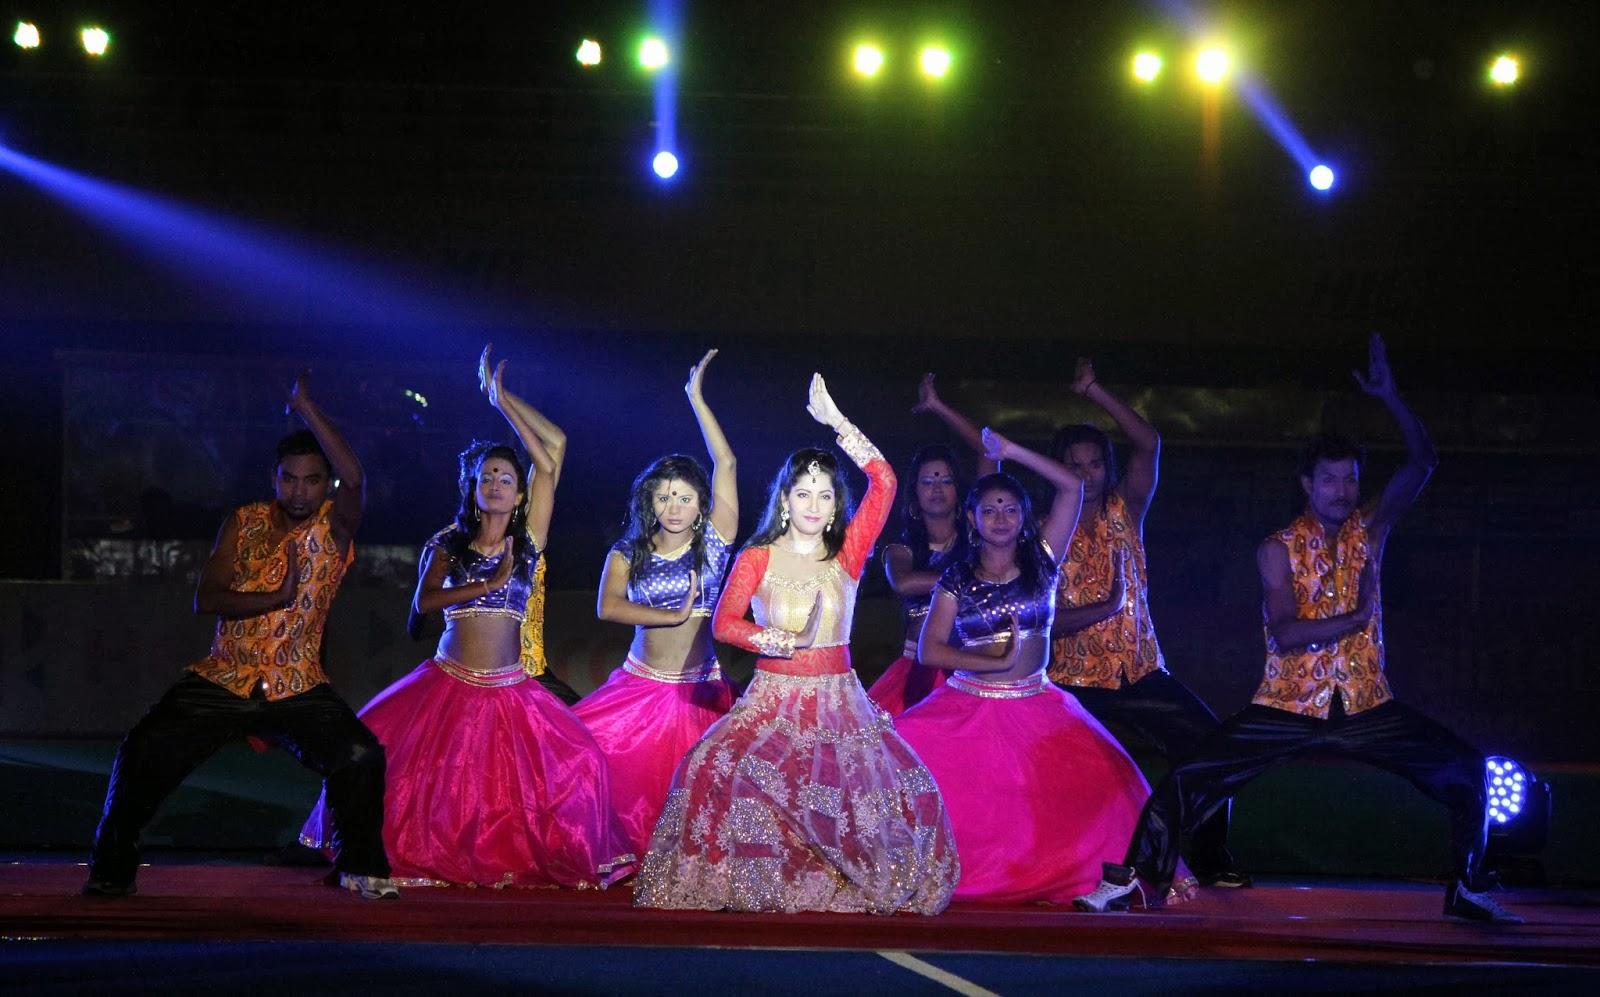 HHIL 2914: Odia movie star Akash and Anu Choudhury